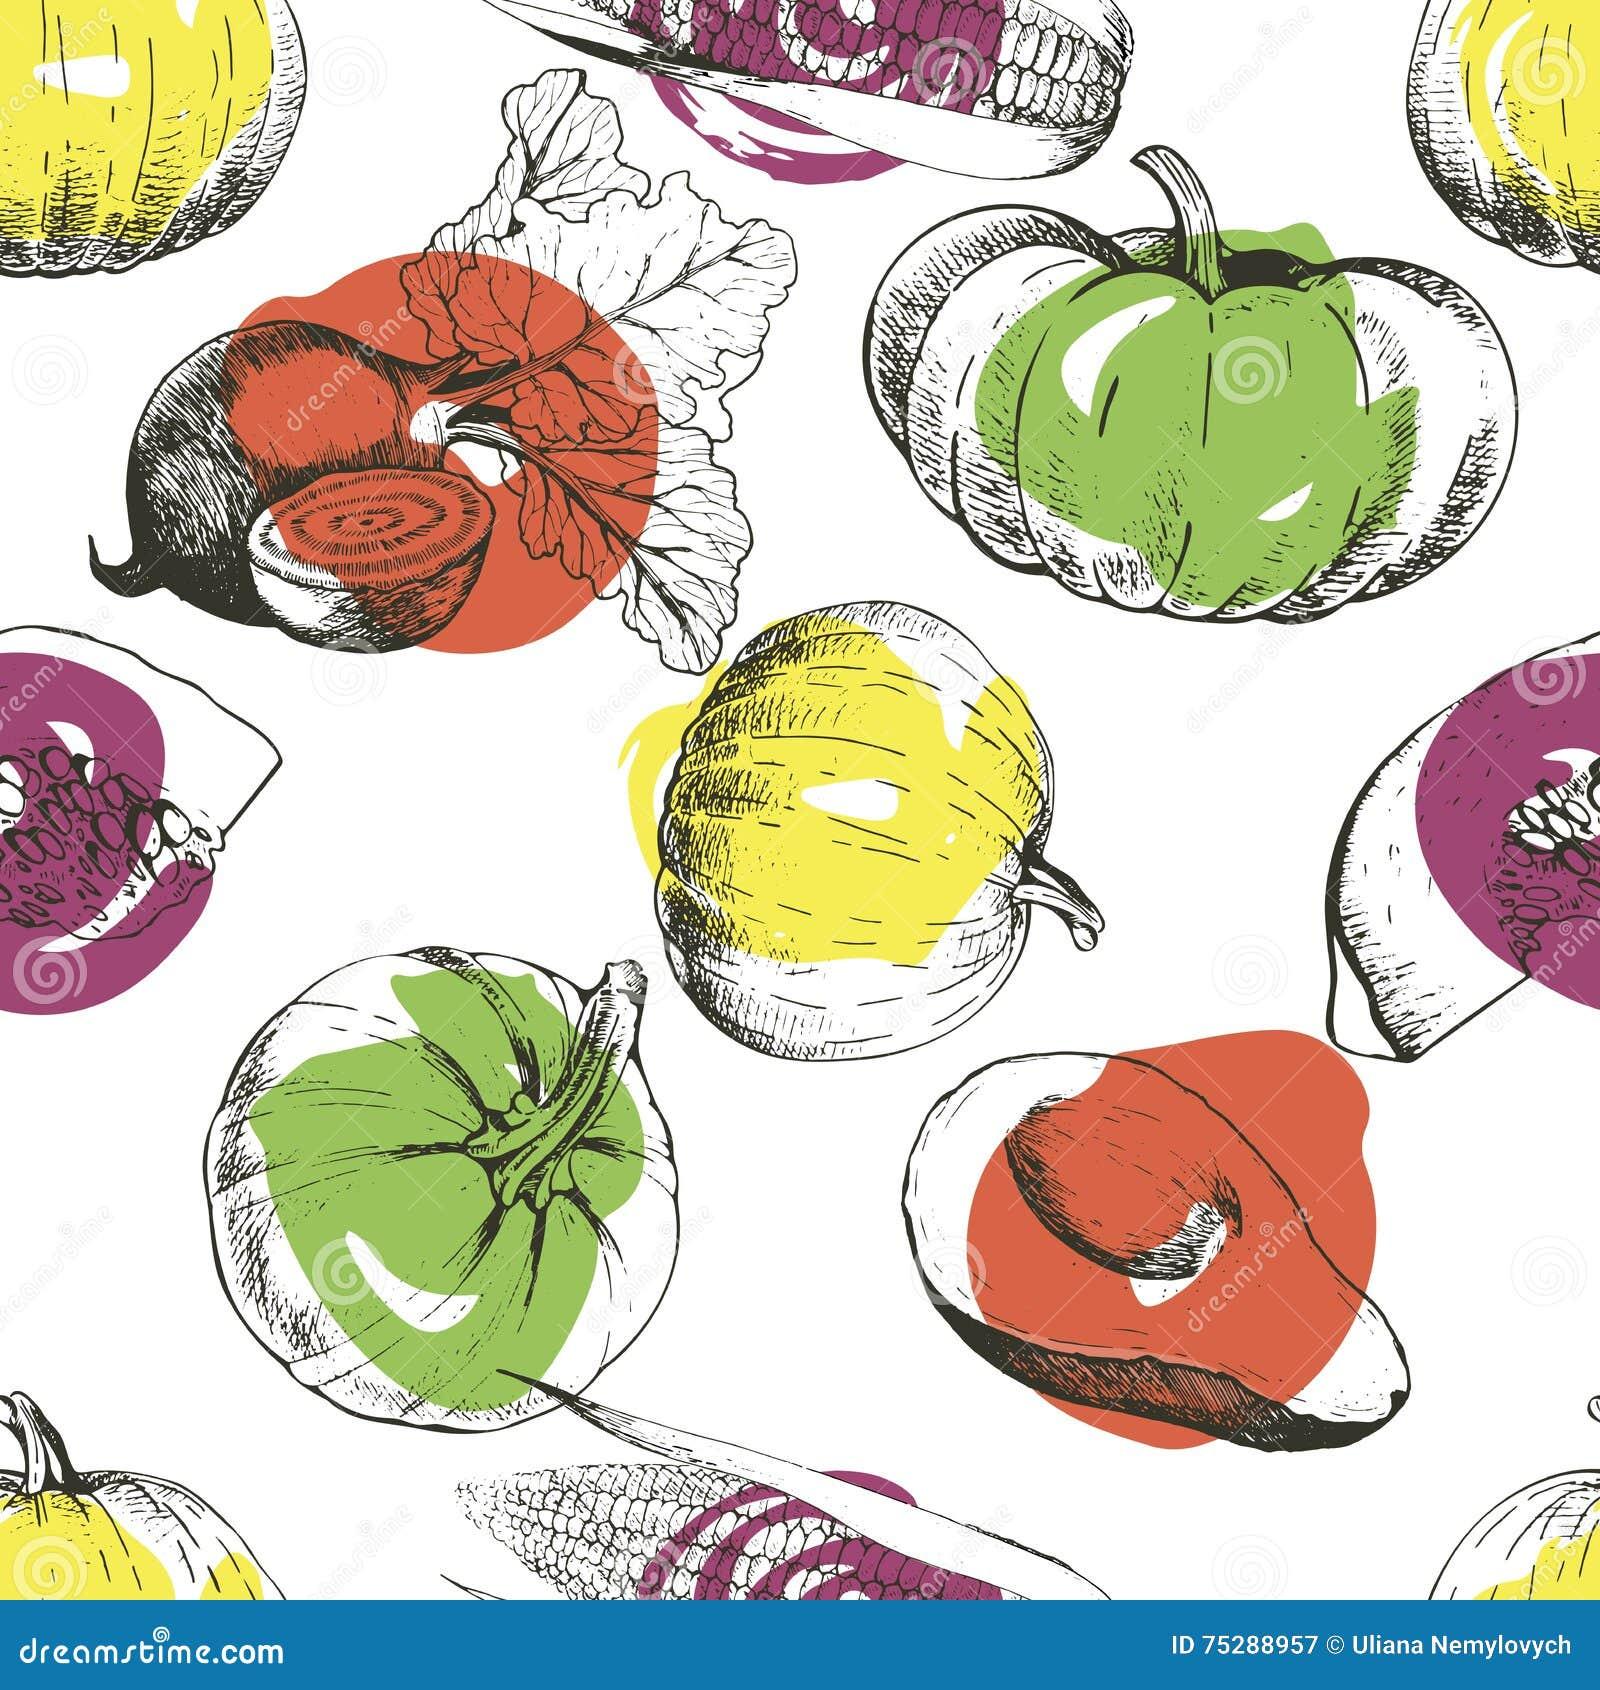 Vector seamless pattern of vegetables. Pumpkin, corn, beetroot, avocado. Hand drawn engraved vintage illustration.